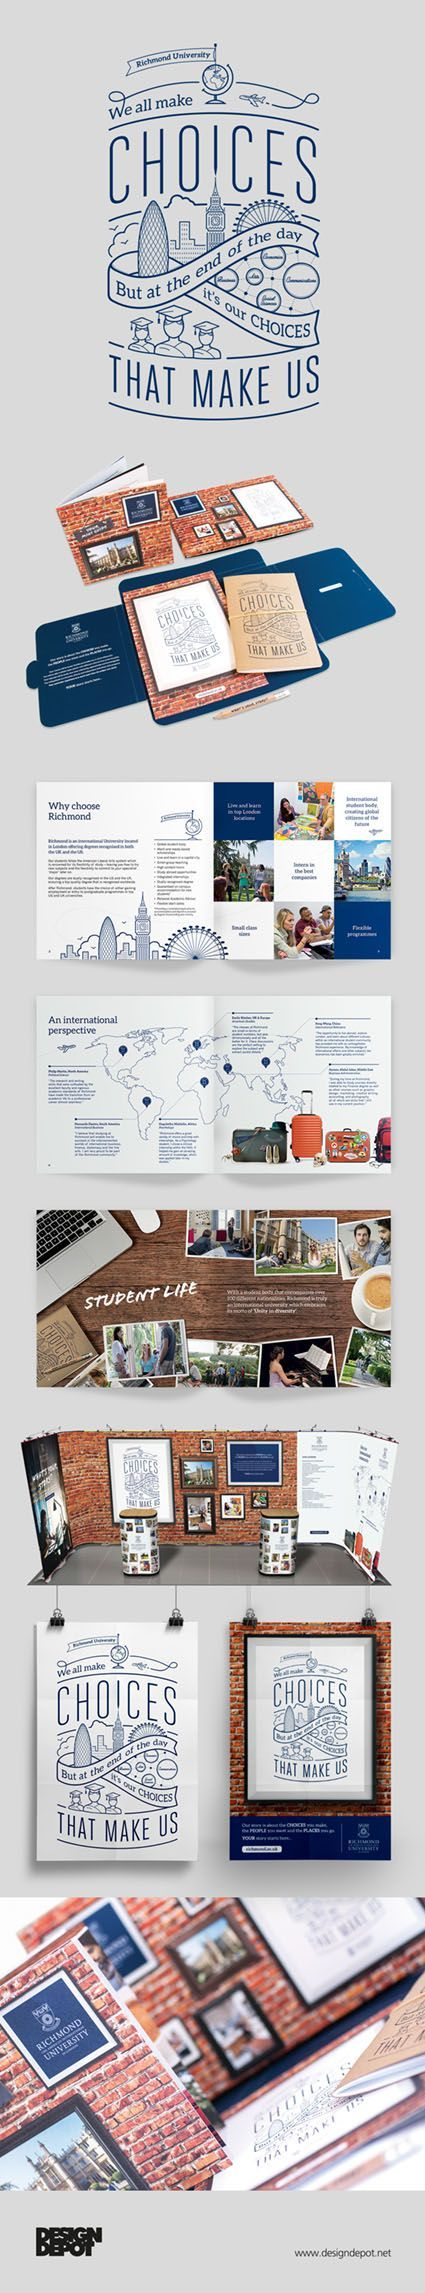 Richmond artwork, London, university, identity, welcome pack, branding, design depot, prospectus, education, #Design #jablonskimarketing